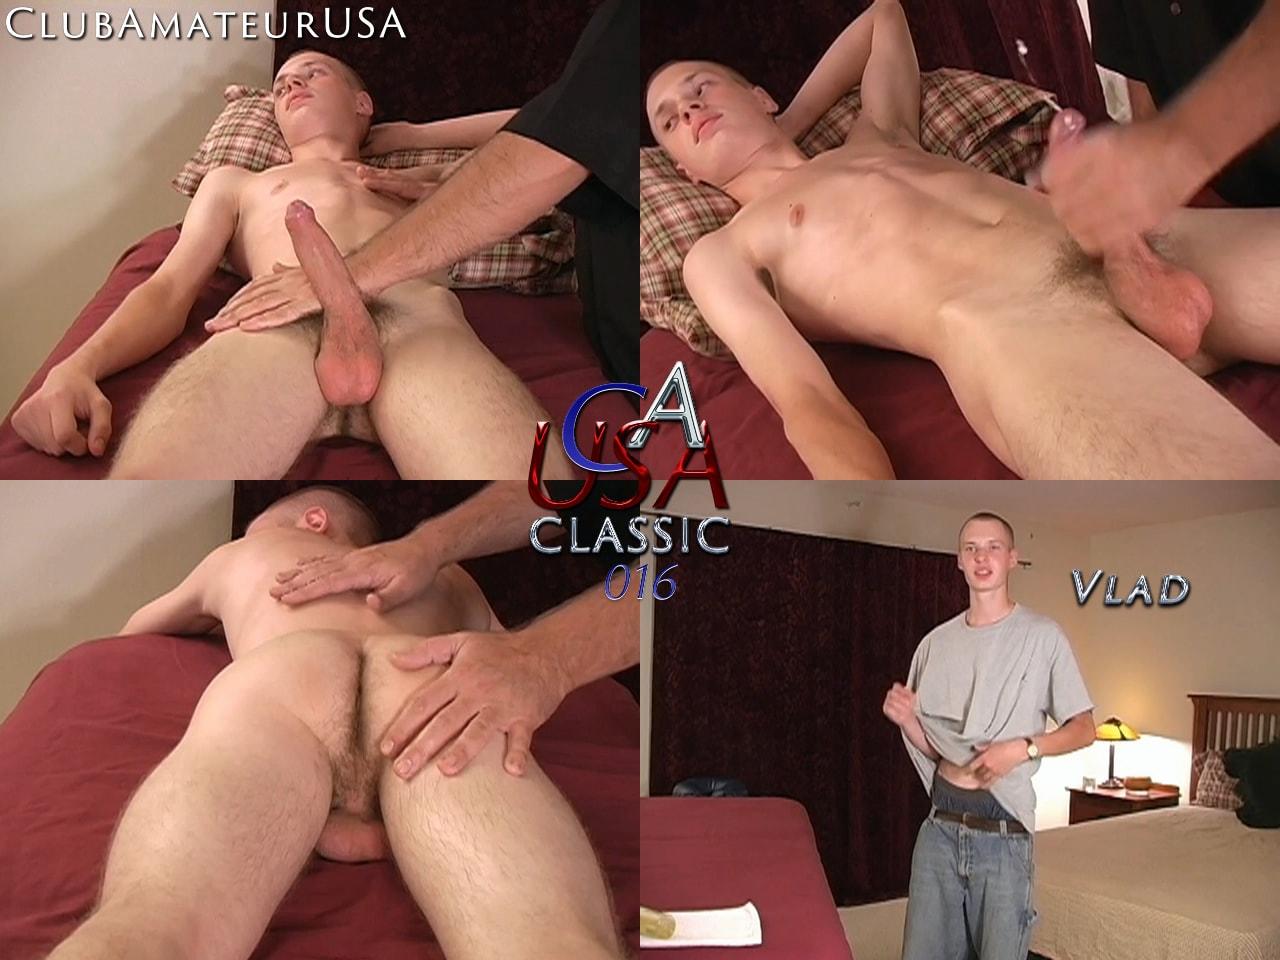 Classic CAUSA 016 Vlad - ClubAmateurUSA Milf sucking nipples